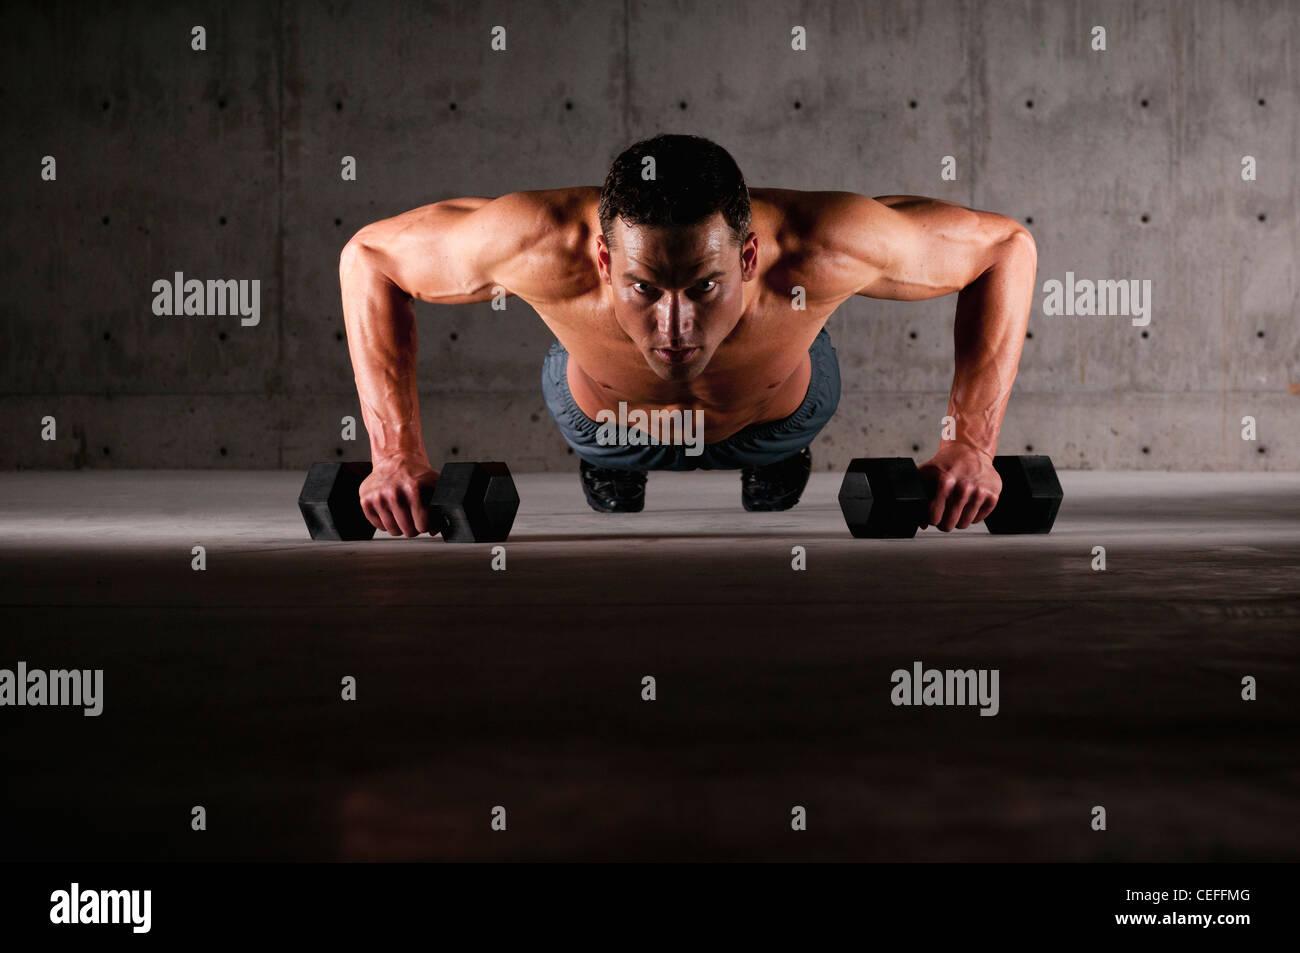 Athlete doing push ups on weights - Stock Image